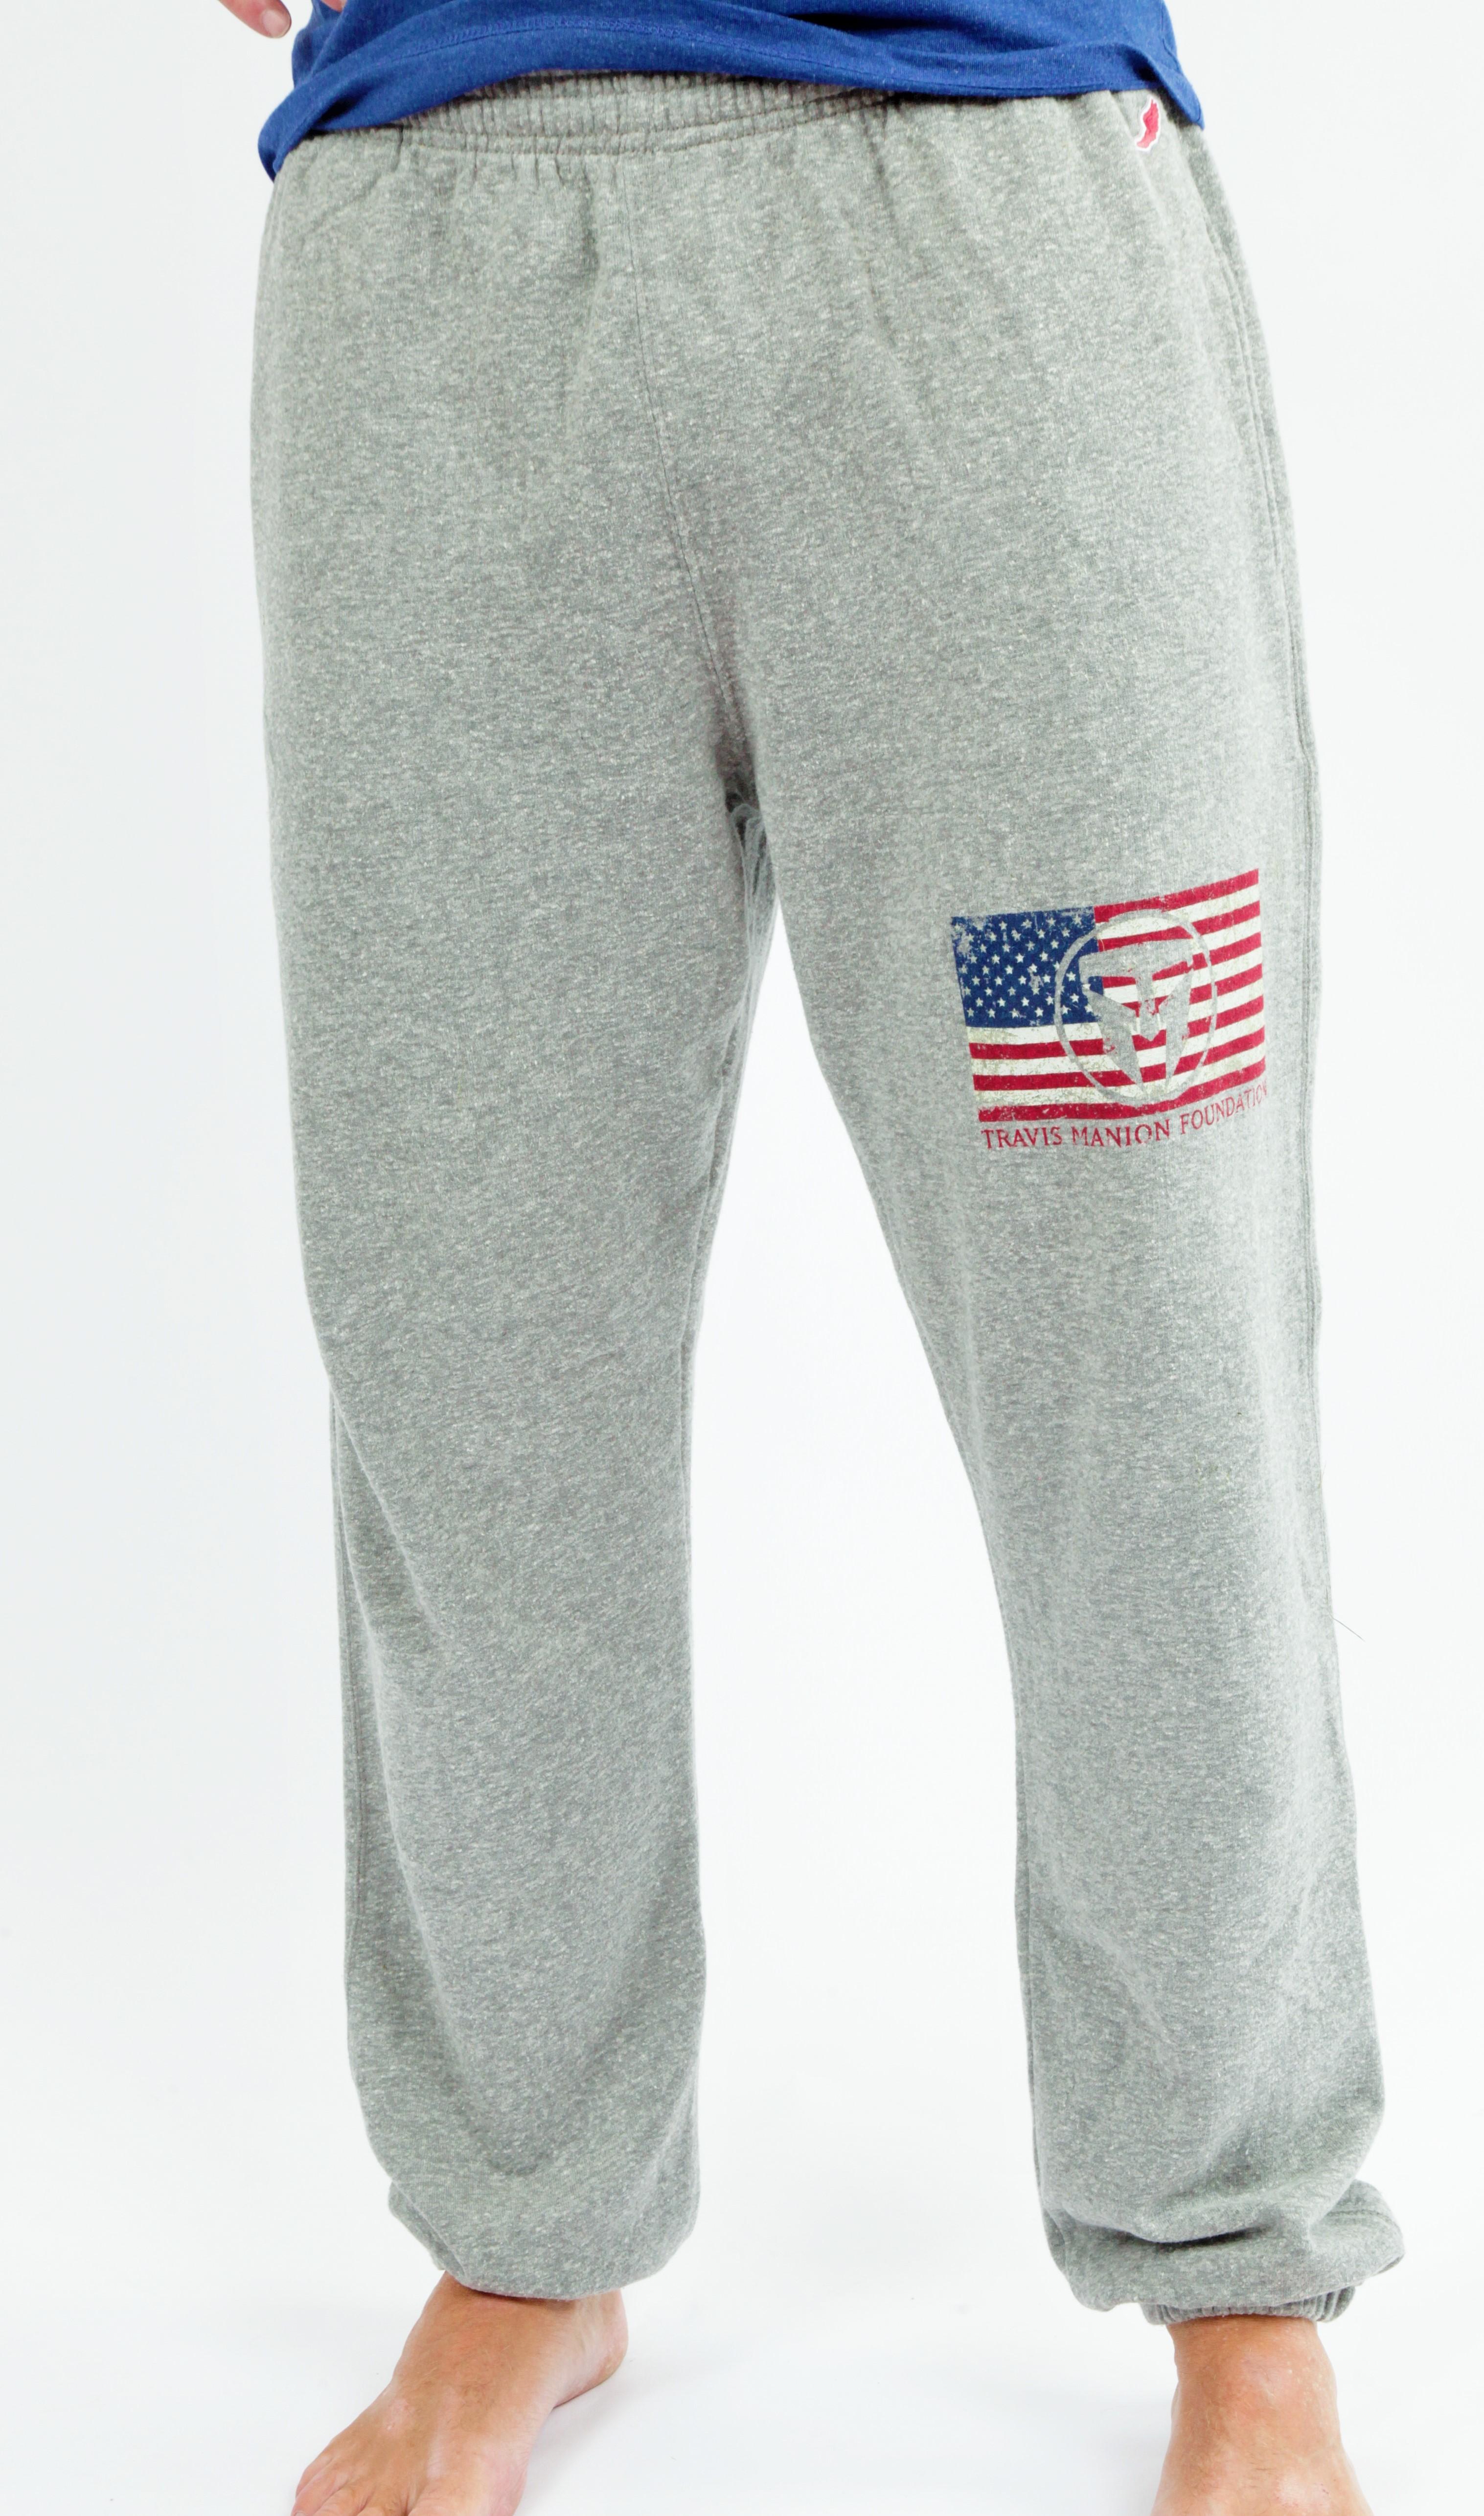 Unisex Tri-Blend TMF Sweatpants